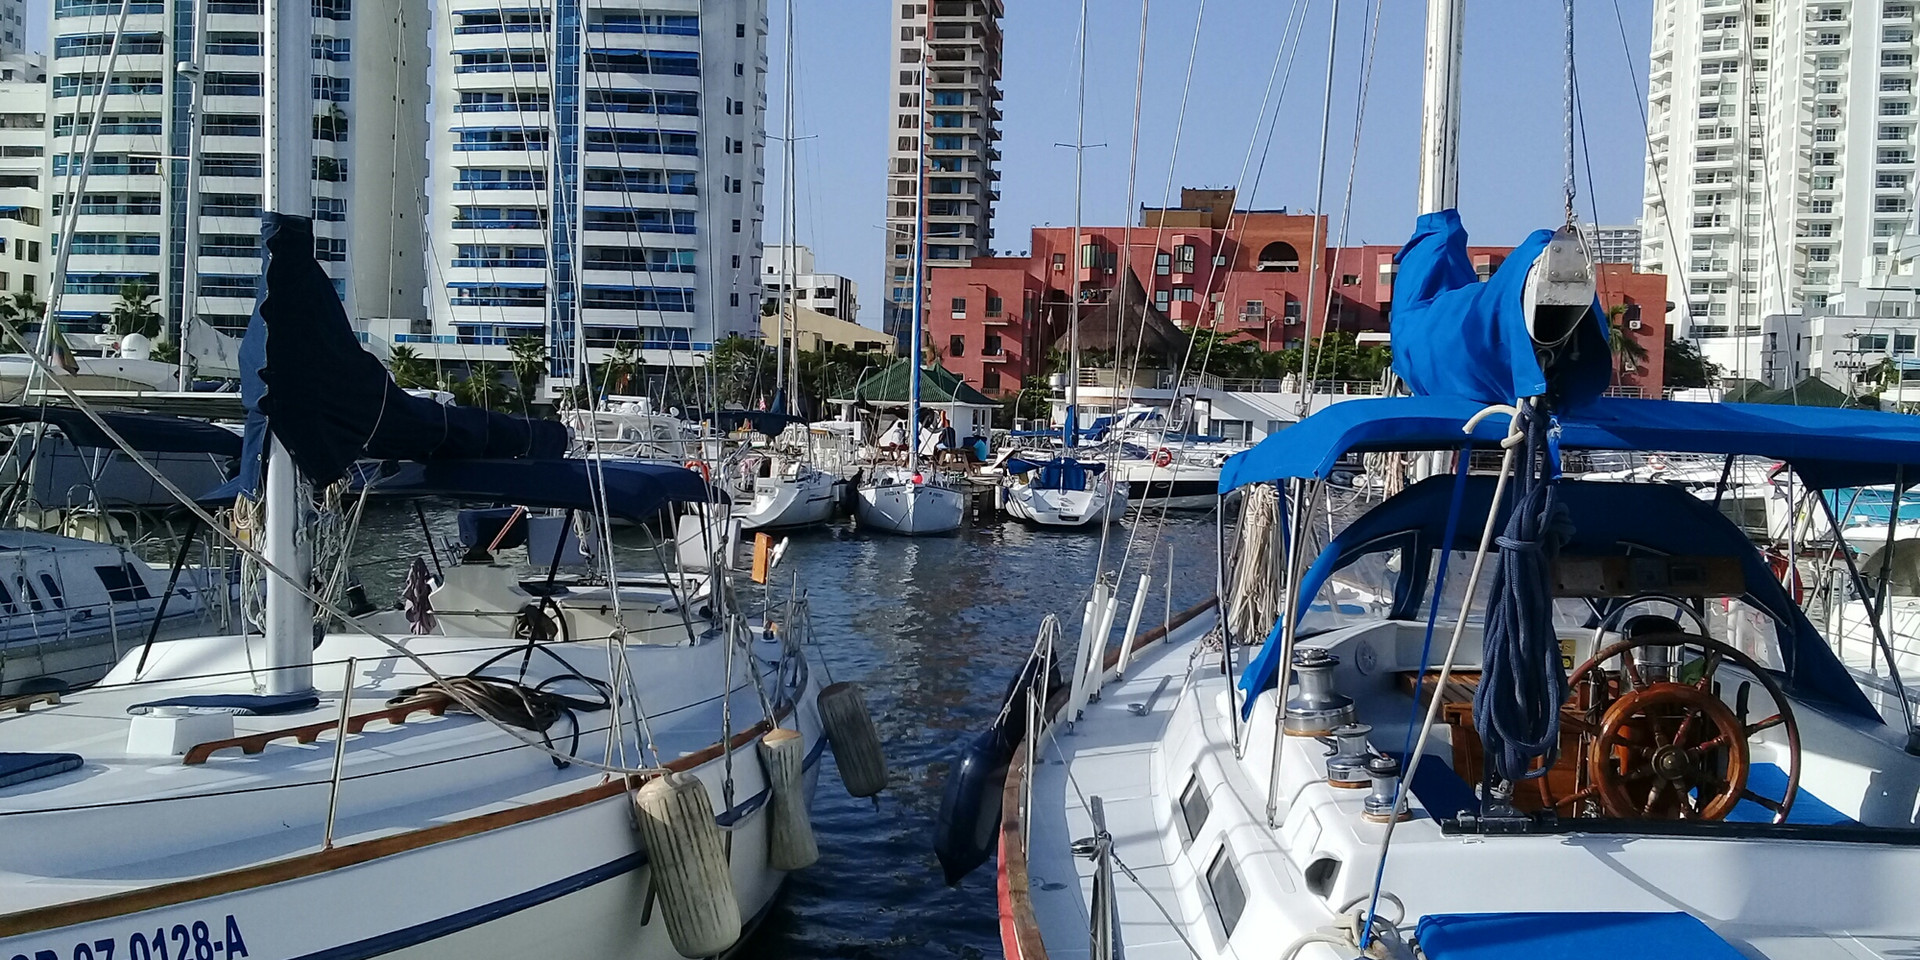 local sailboats.jpg